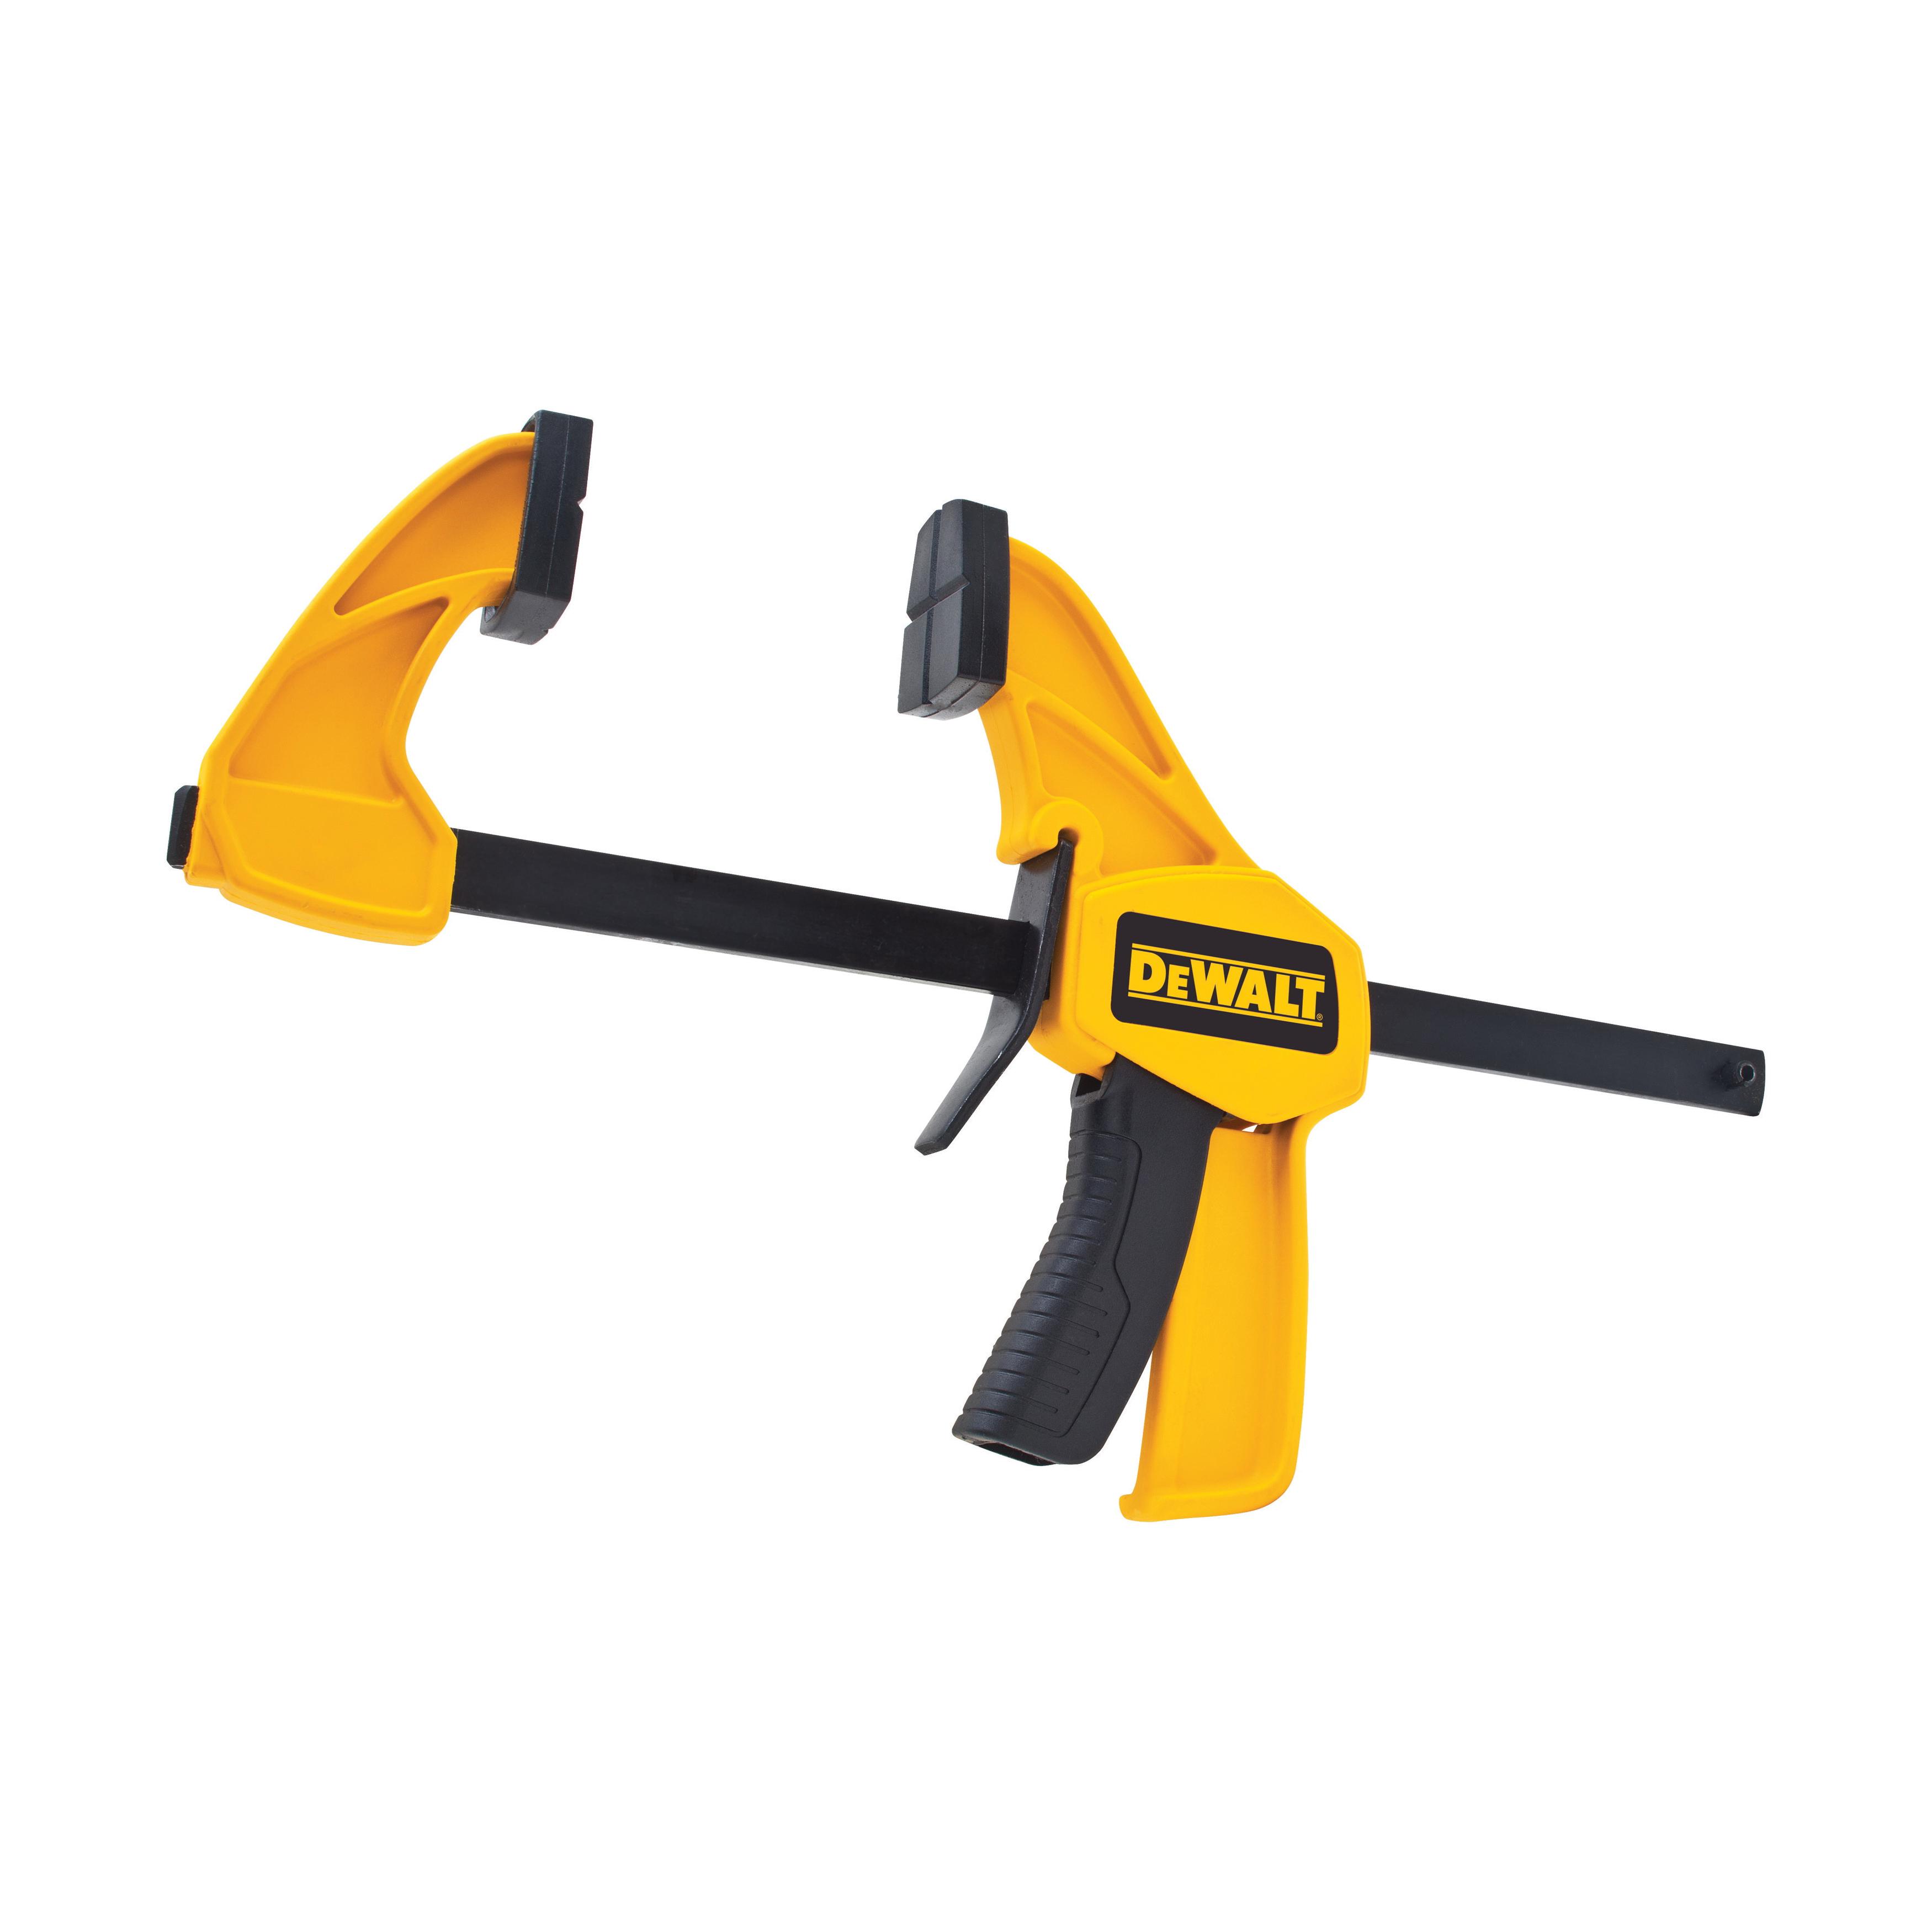 DeWALT® DWHT83139 1-Handed Medium Trigger Clamp, 6 in Clamping, 2-7/16 in D Throat, Steel Bar